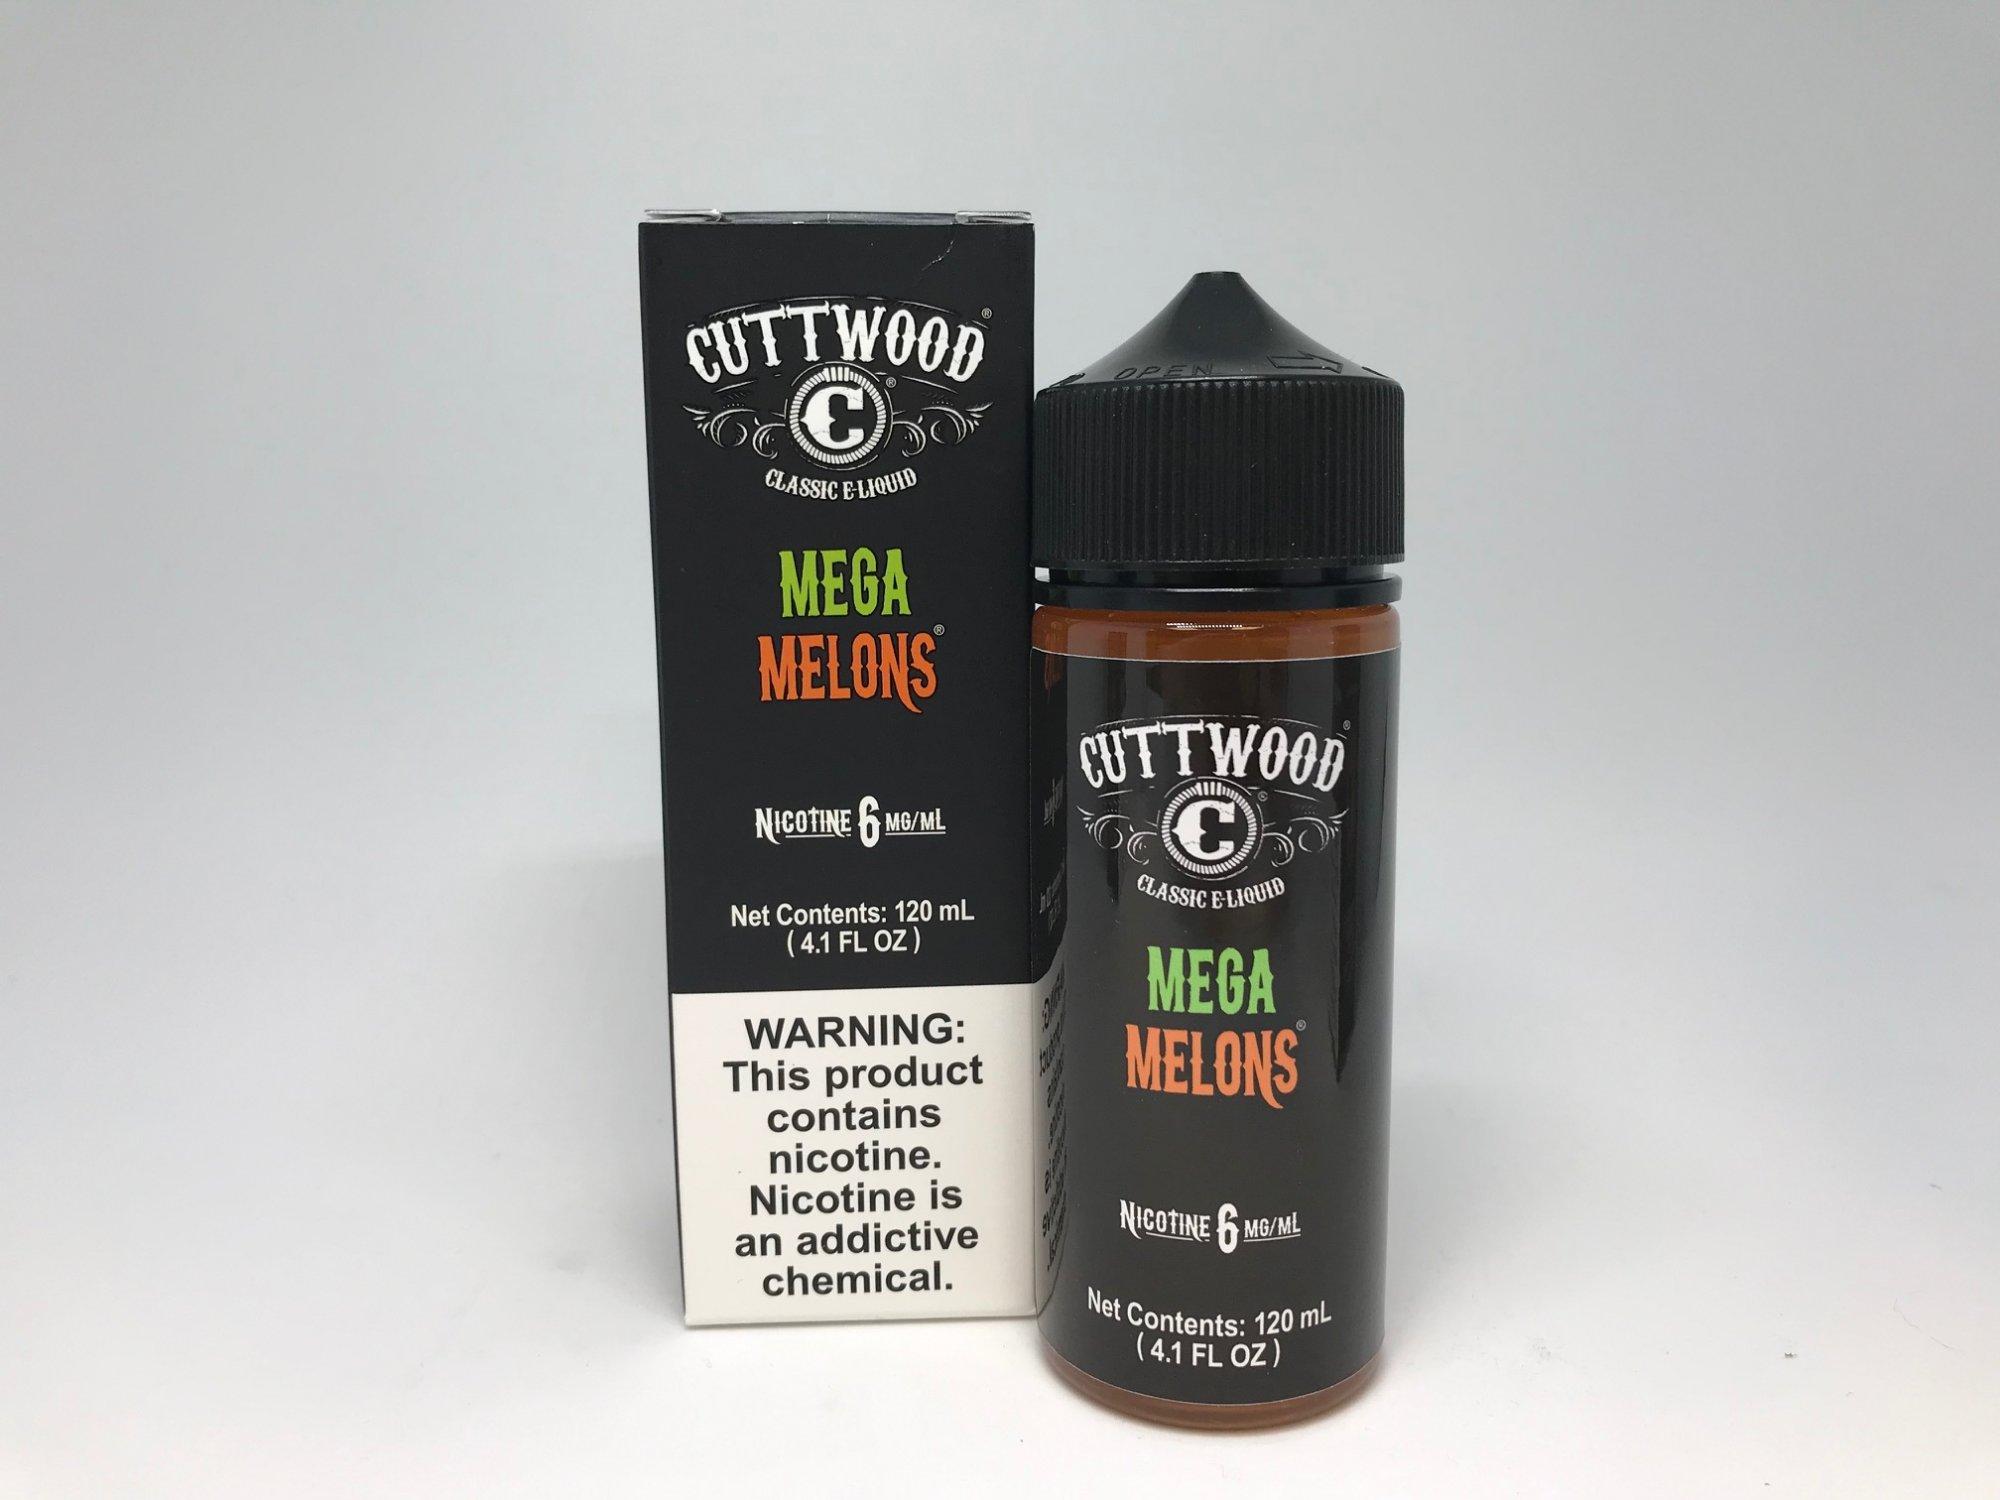 Cuttwood Mega Melons eJuice